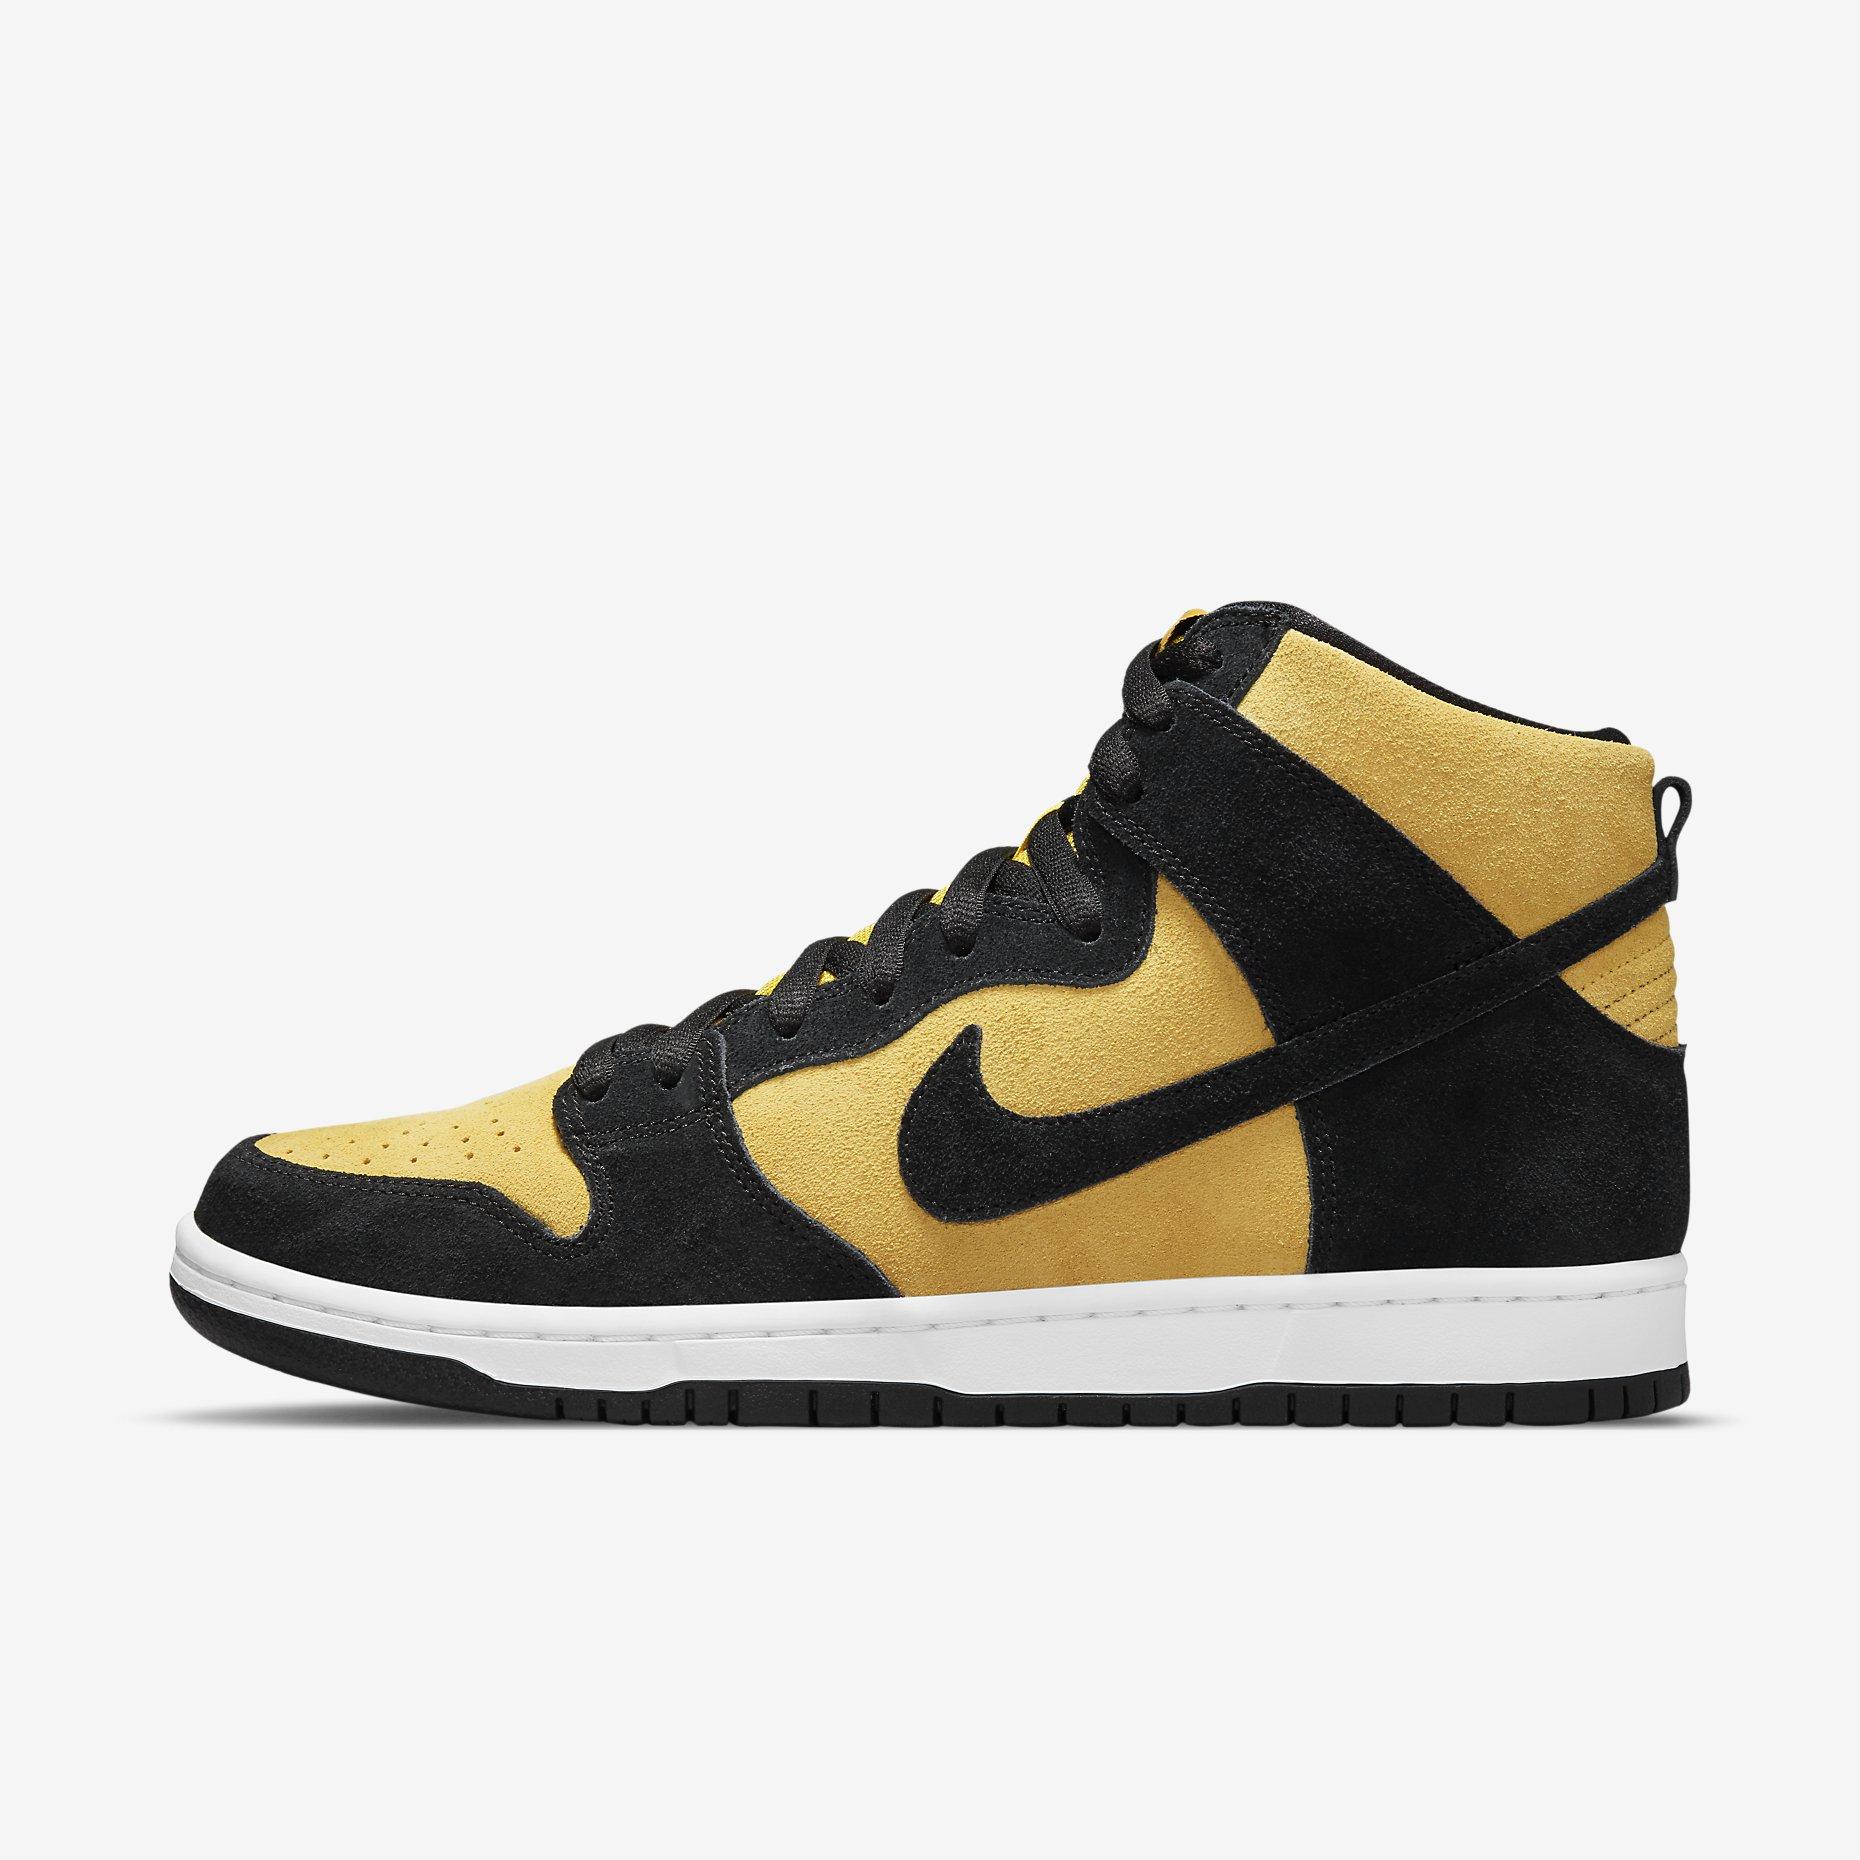 Nike SB Dunk High Pro 'Maize and Black'}